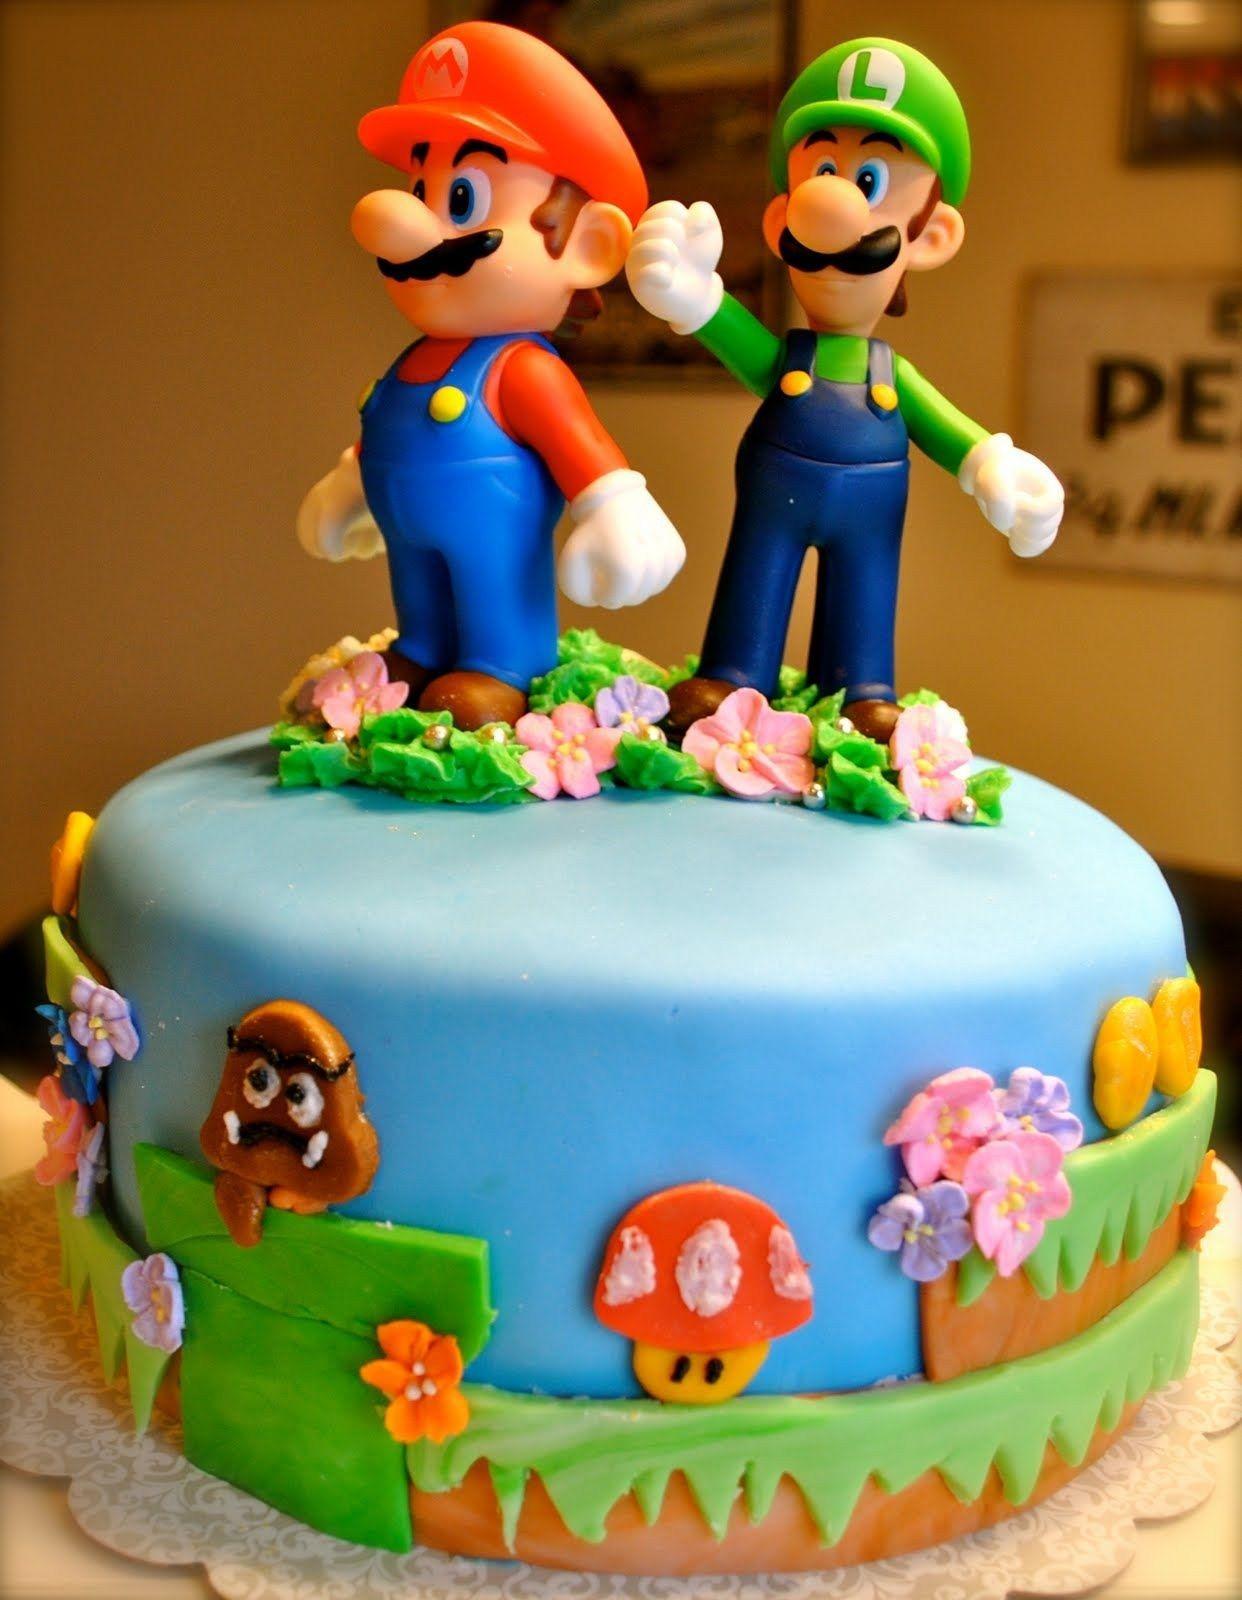 32 Brilliant Photo Of Mario Bros Birthday Cake With Images